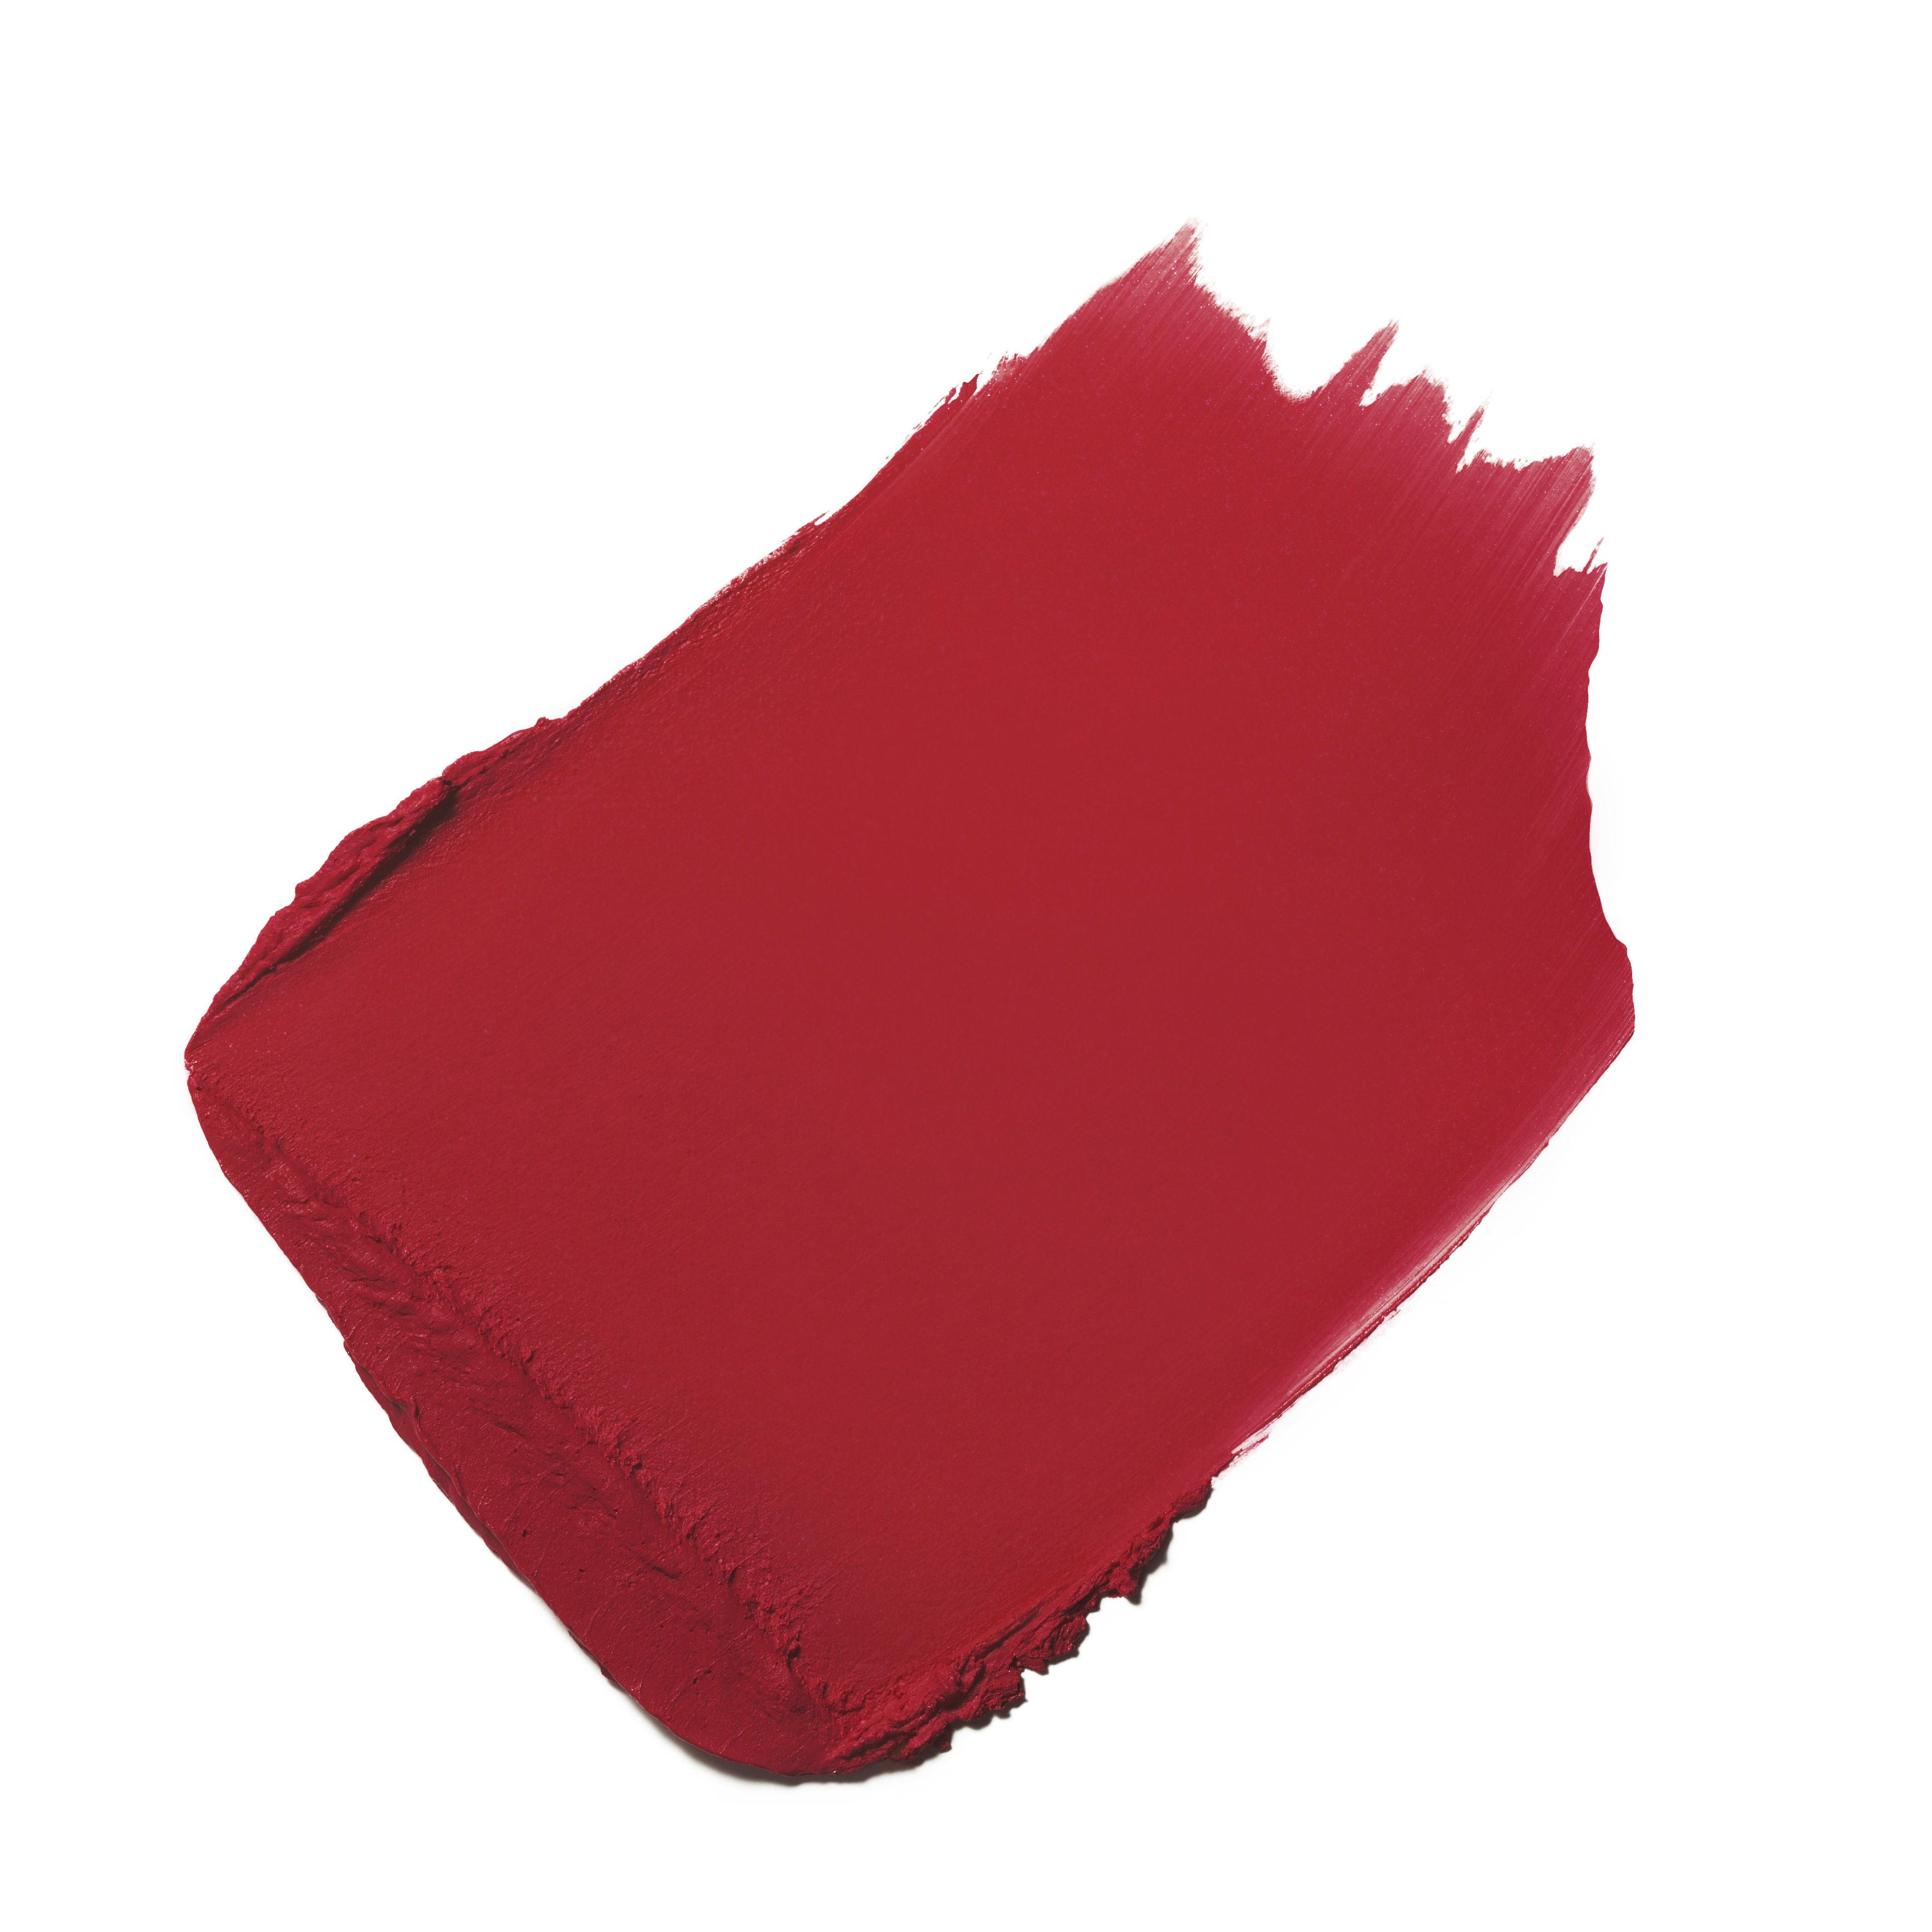 ROUGE ALLURE VELVET - makeup - 3.5g - Basic texture view